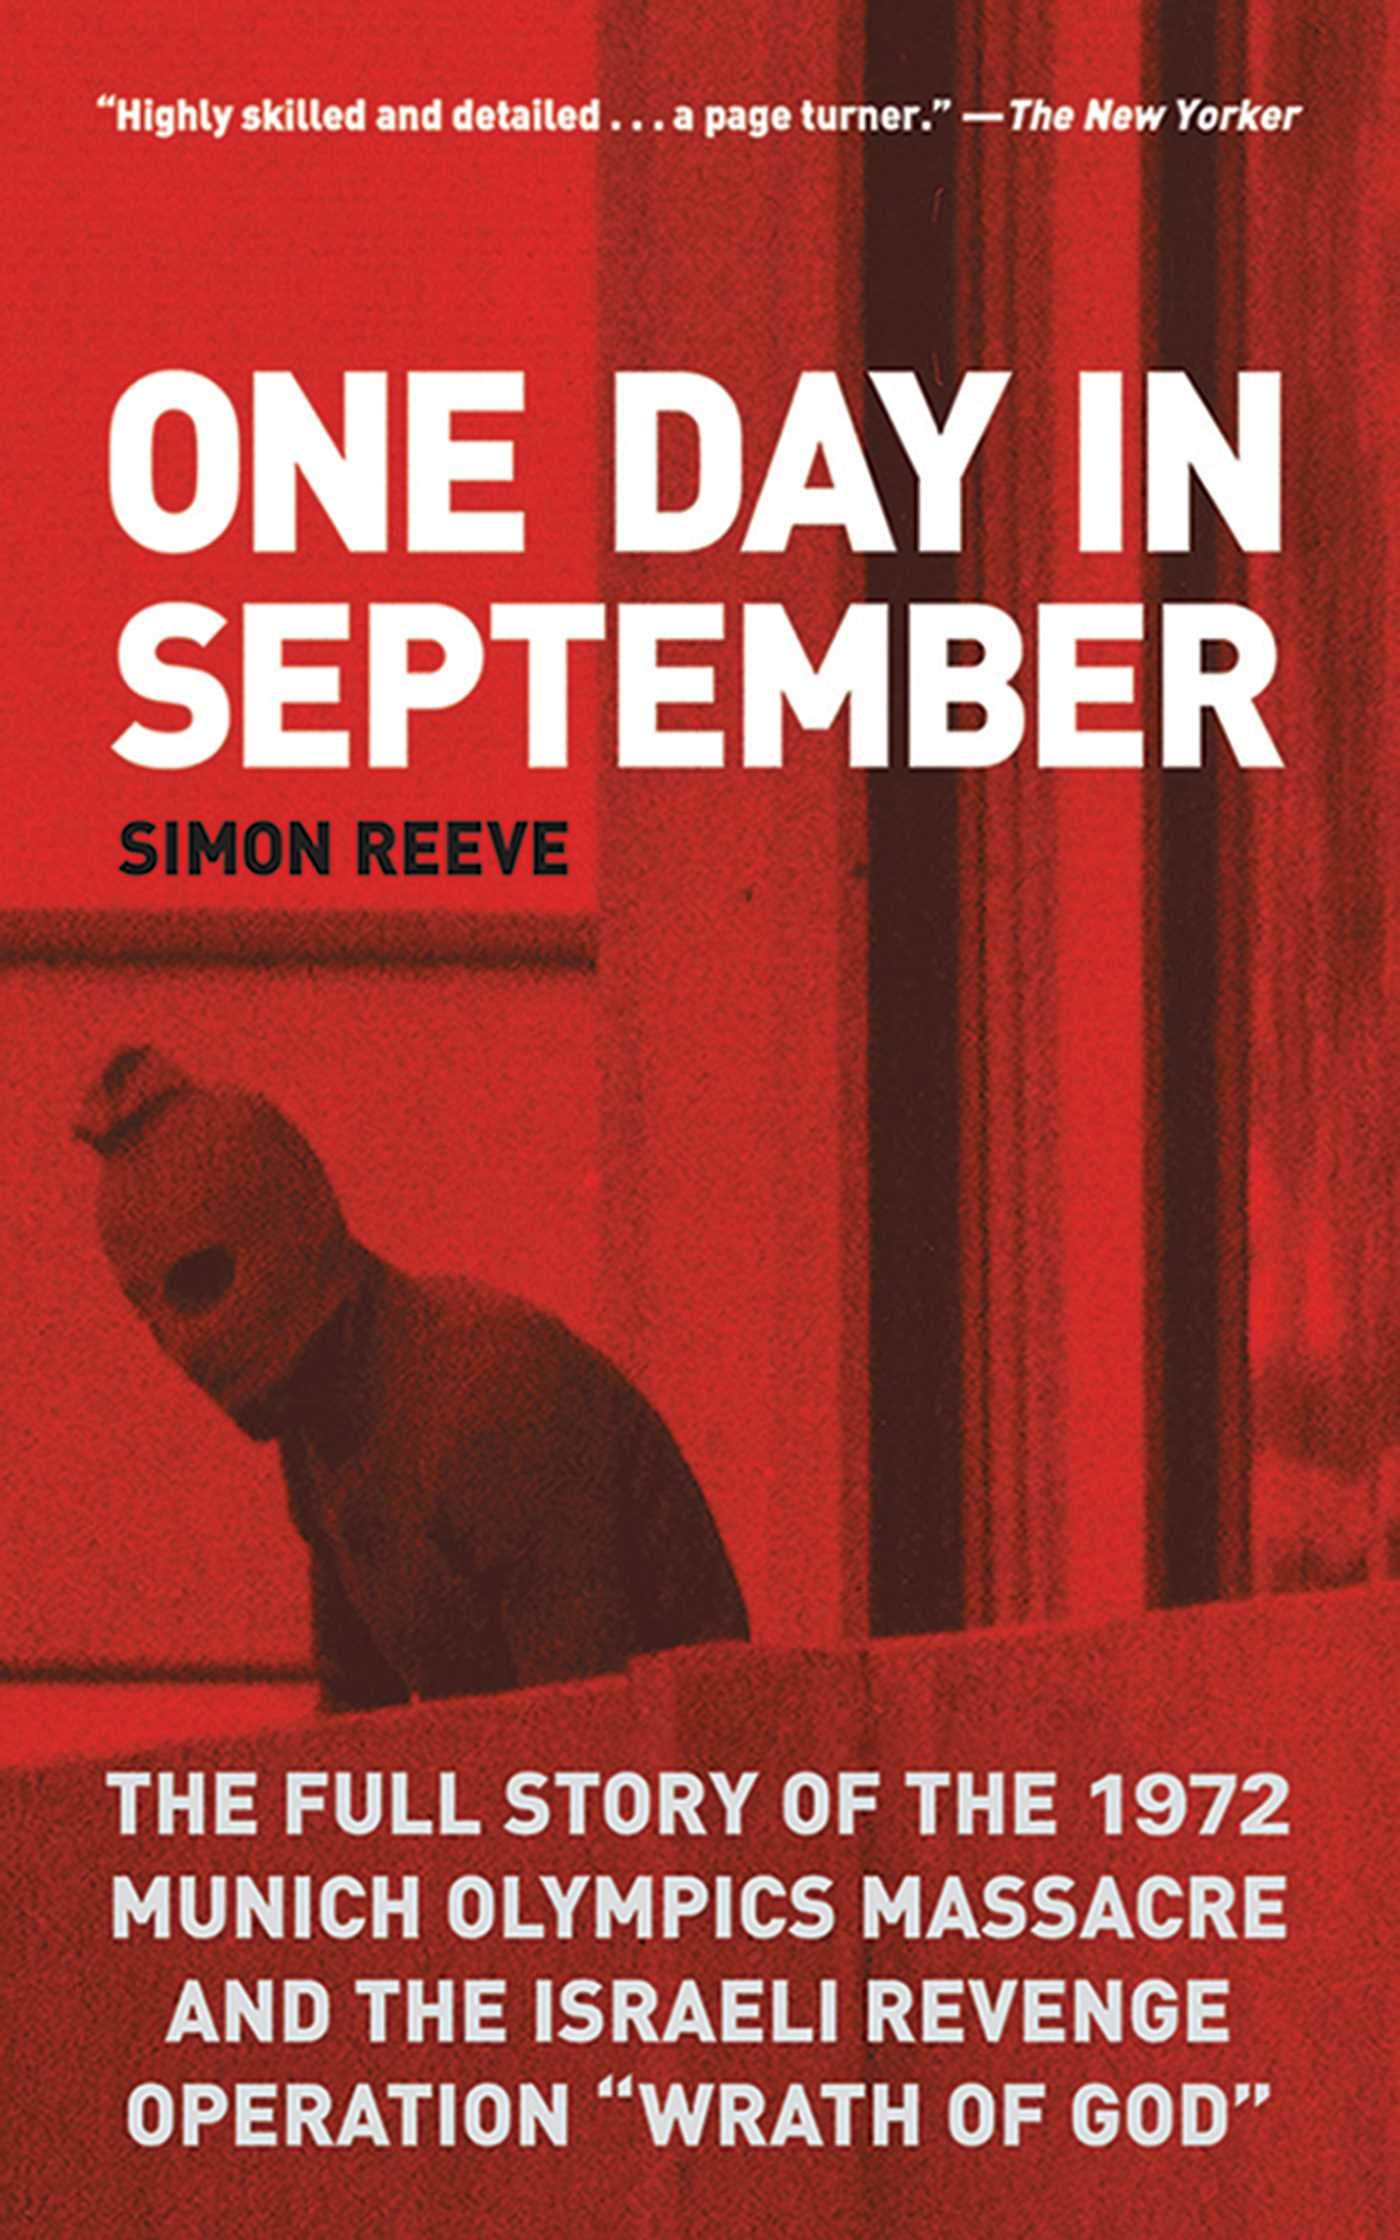 One Day in September. The Full Story of the 1972 Munich Olympics Massacre and the Israeli Revenge...